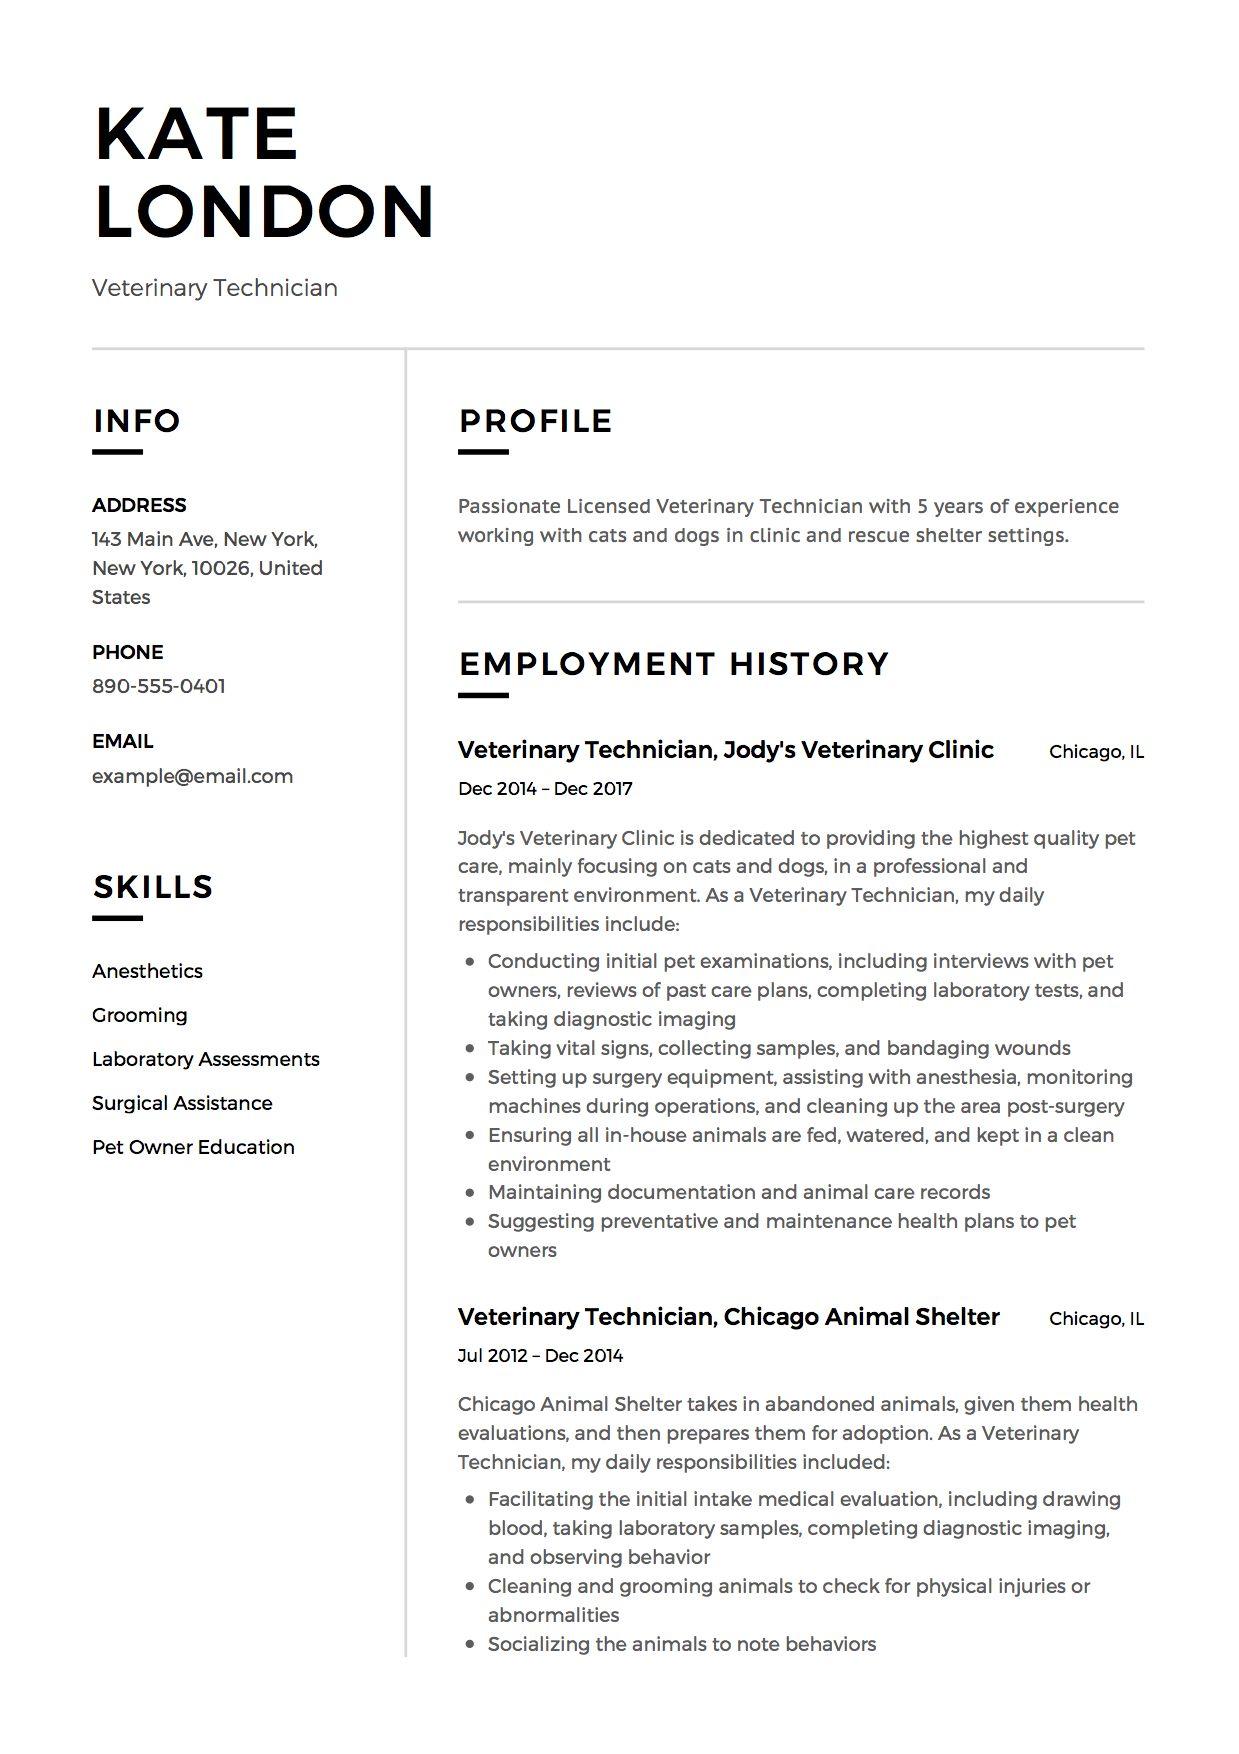 Veterinary Technician Resume Sample, Template, Example, CV